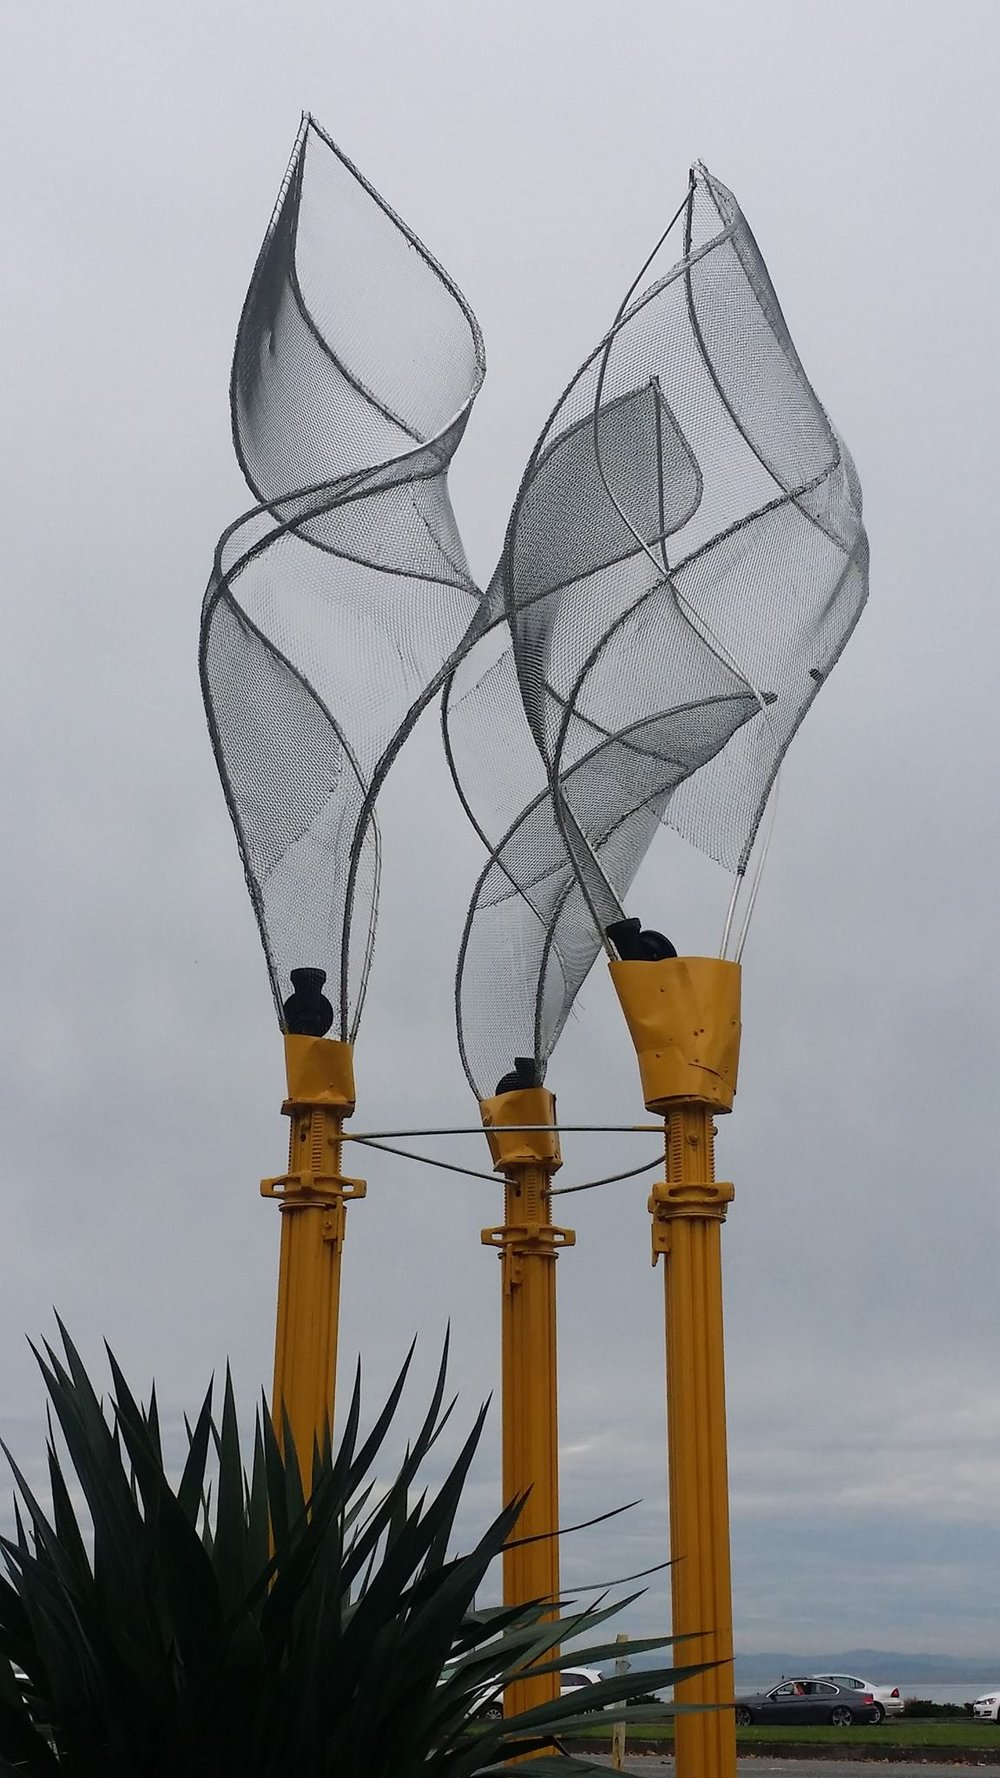 PeaceArchSculpture.jpg